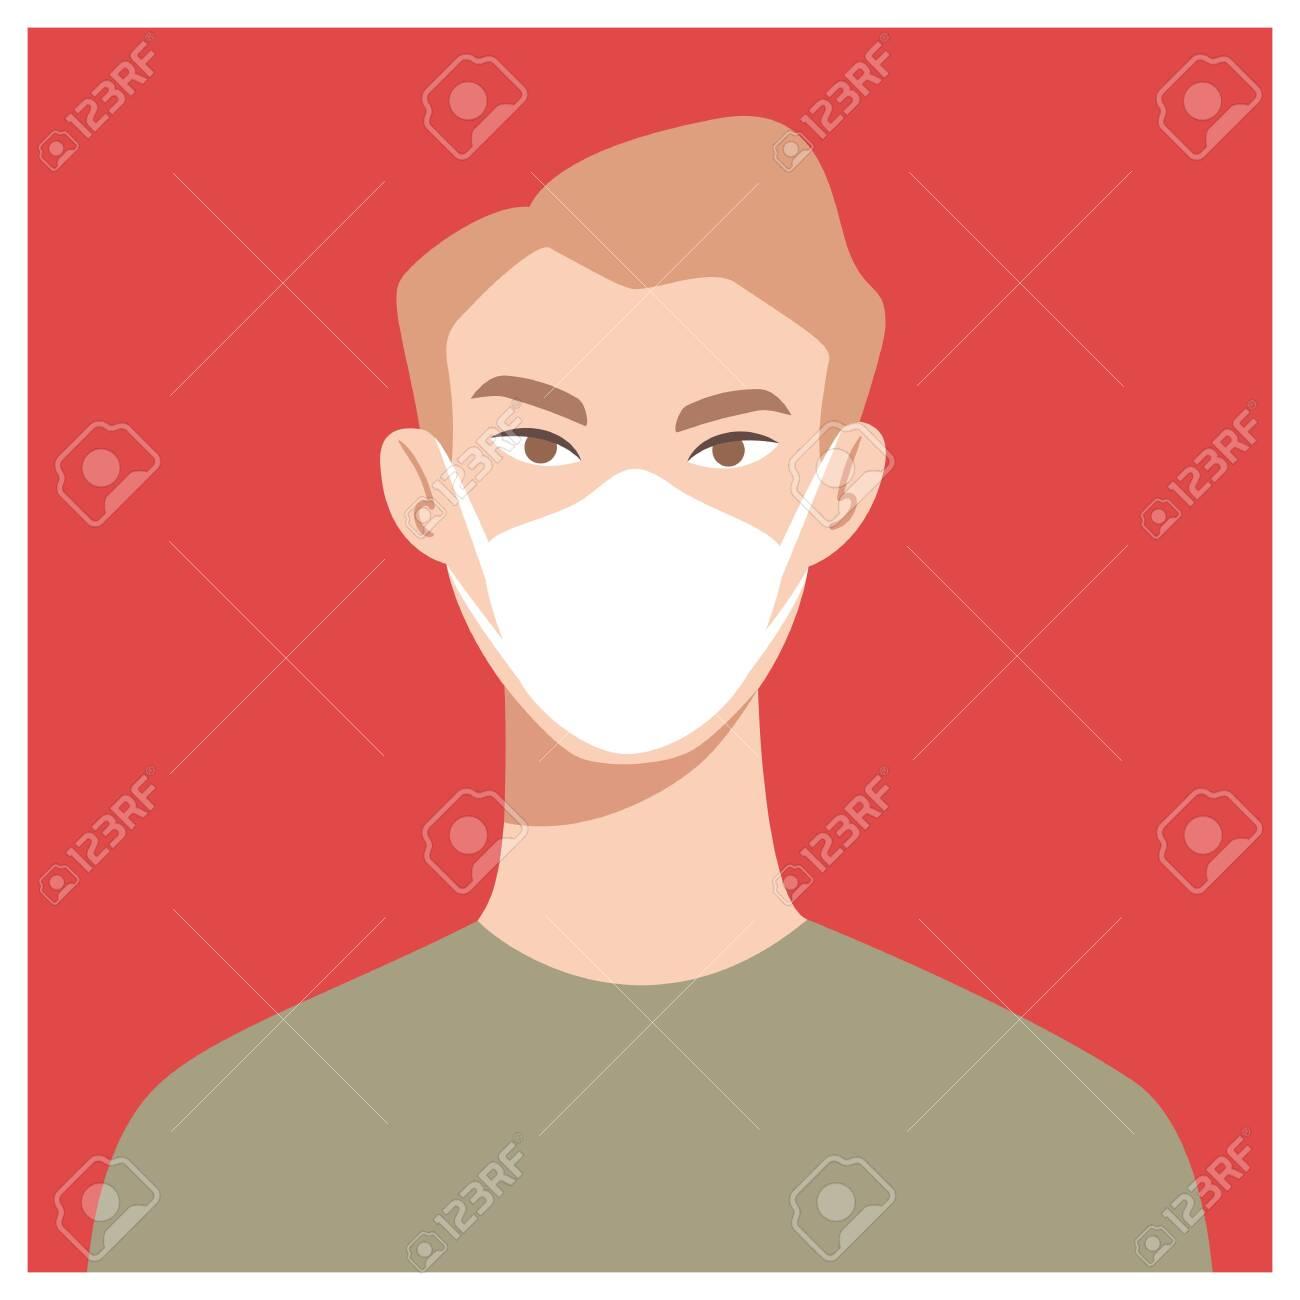 Man in white medical face mask. Coronavirus in World. Concept of coronavirus quarantine. COVID-19 2019-nCoV - 142106268